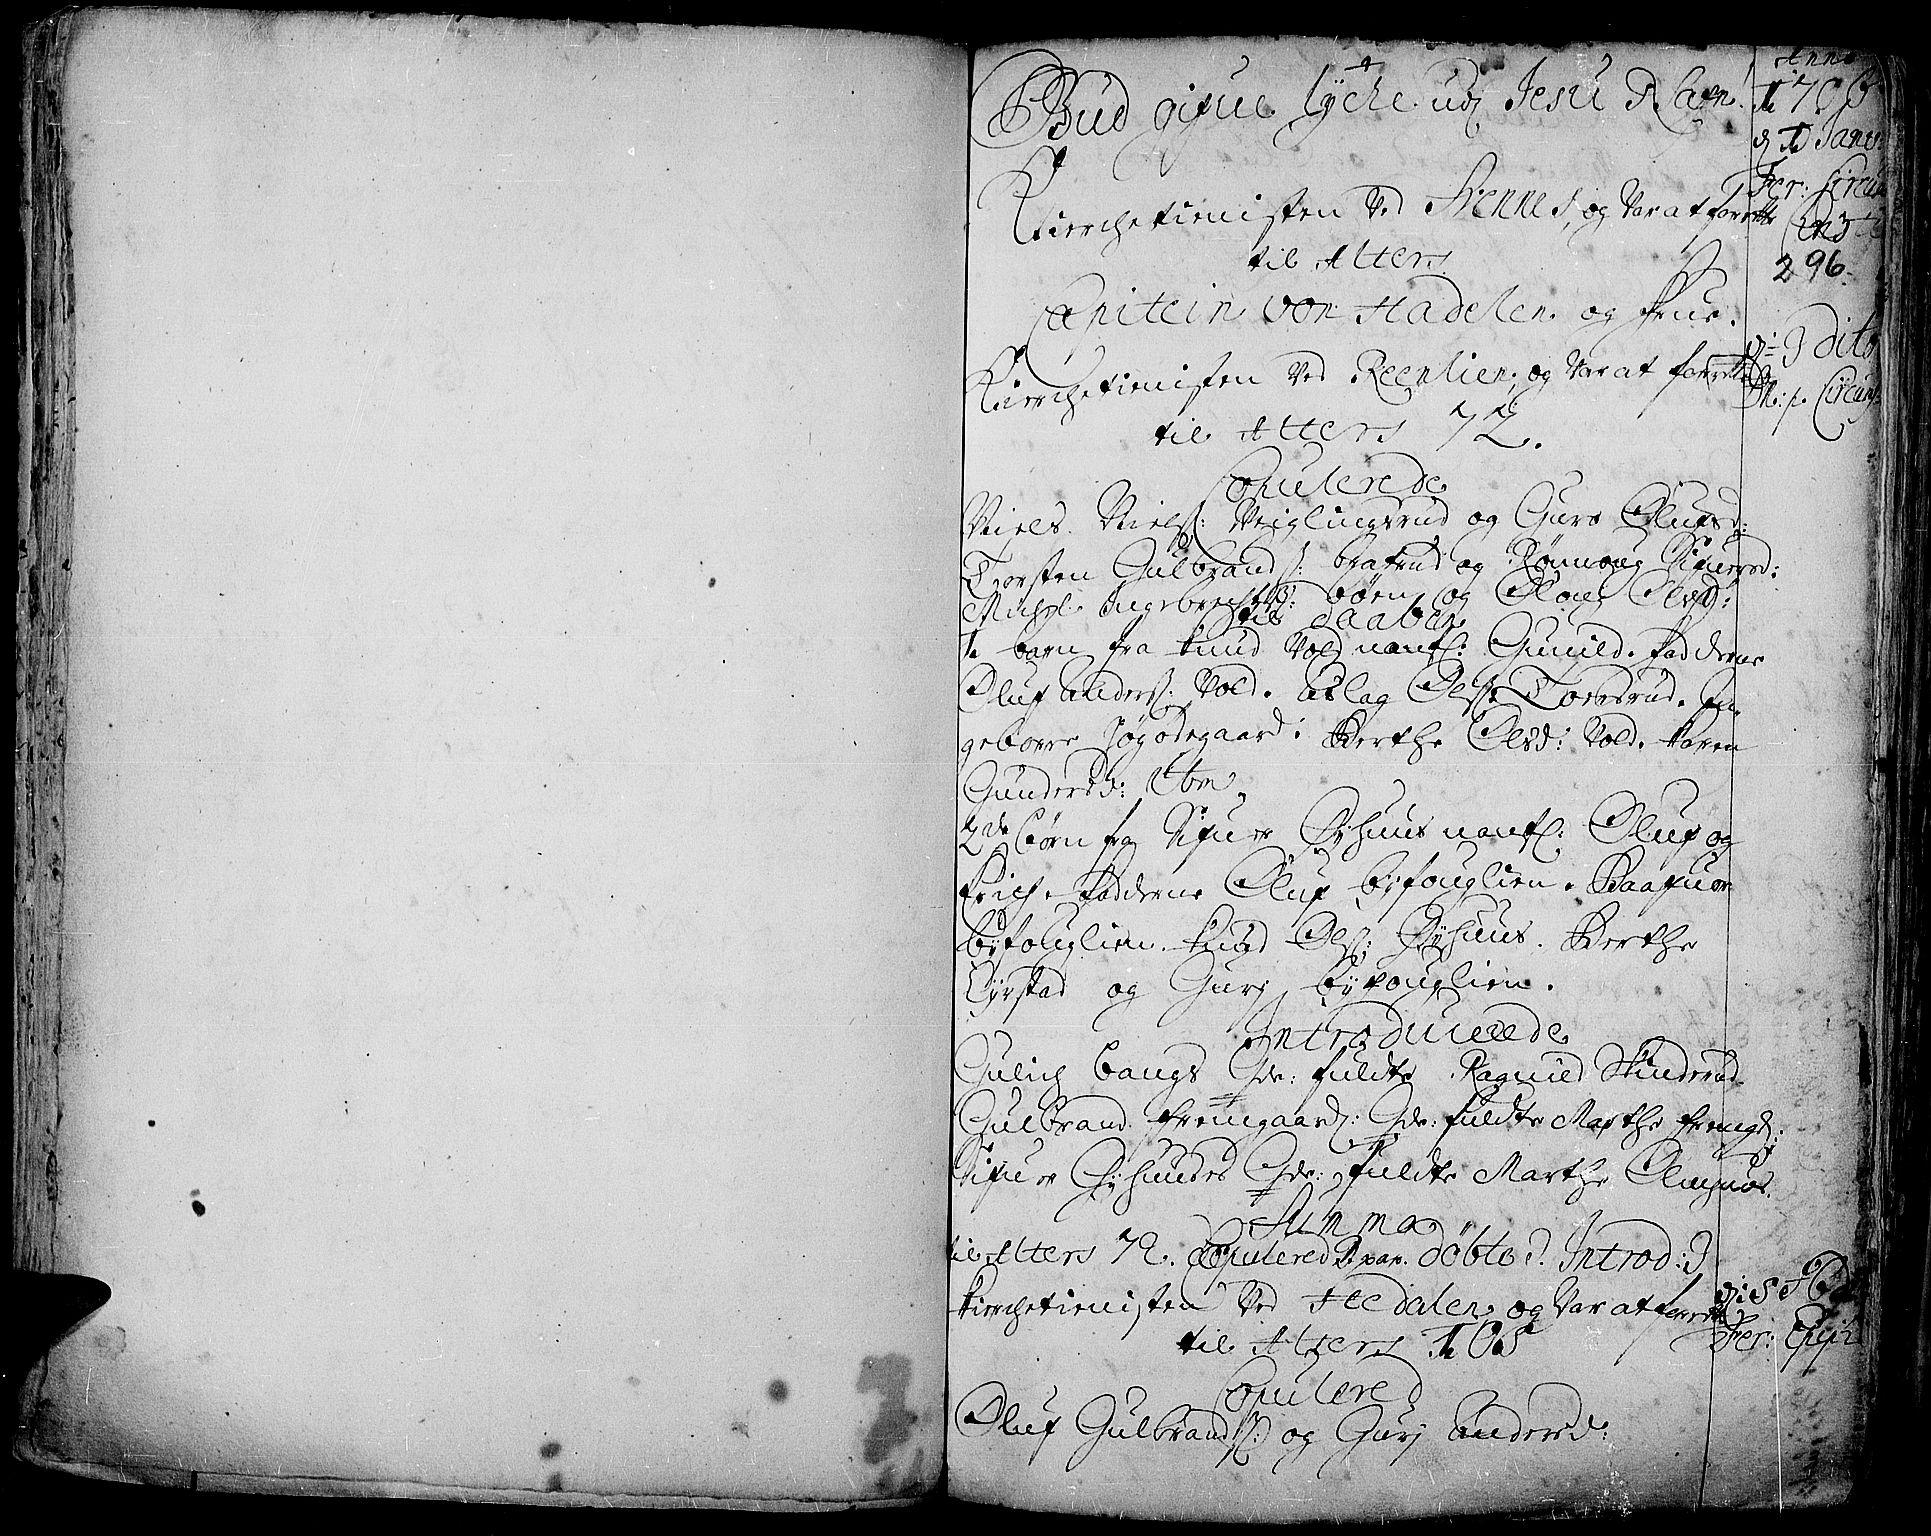 SAH, Aurdal prestekontor, Ministerialbok nr. 1-3, 1692-1730, s. 296